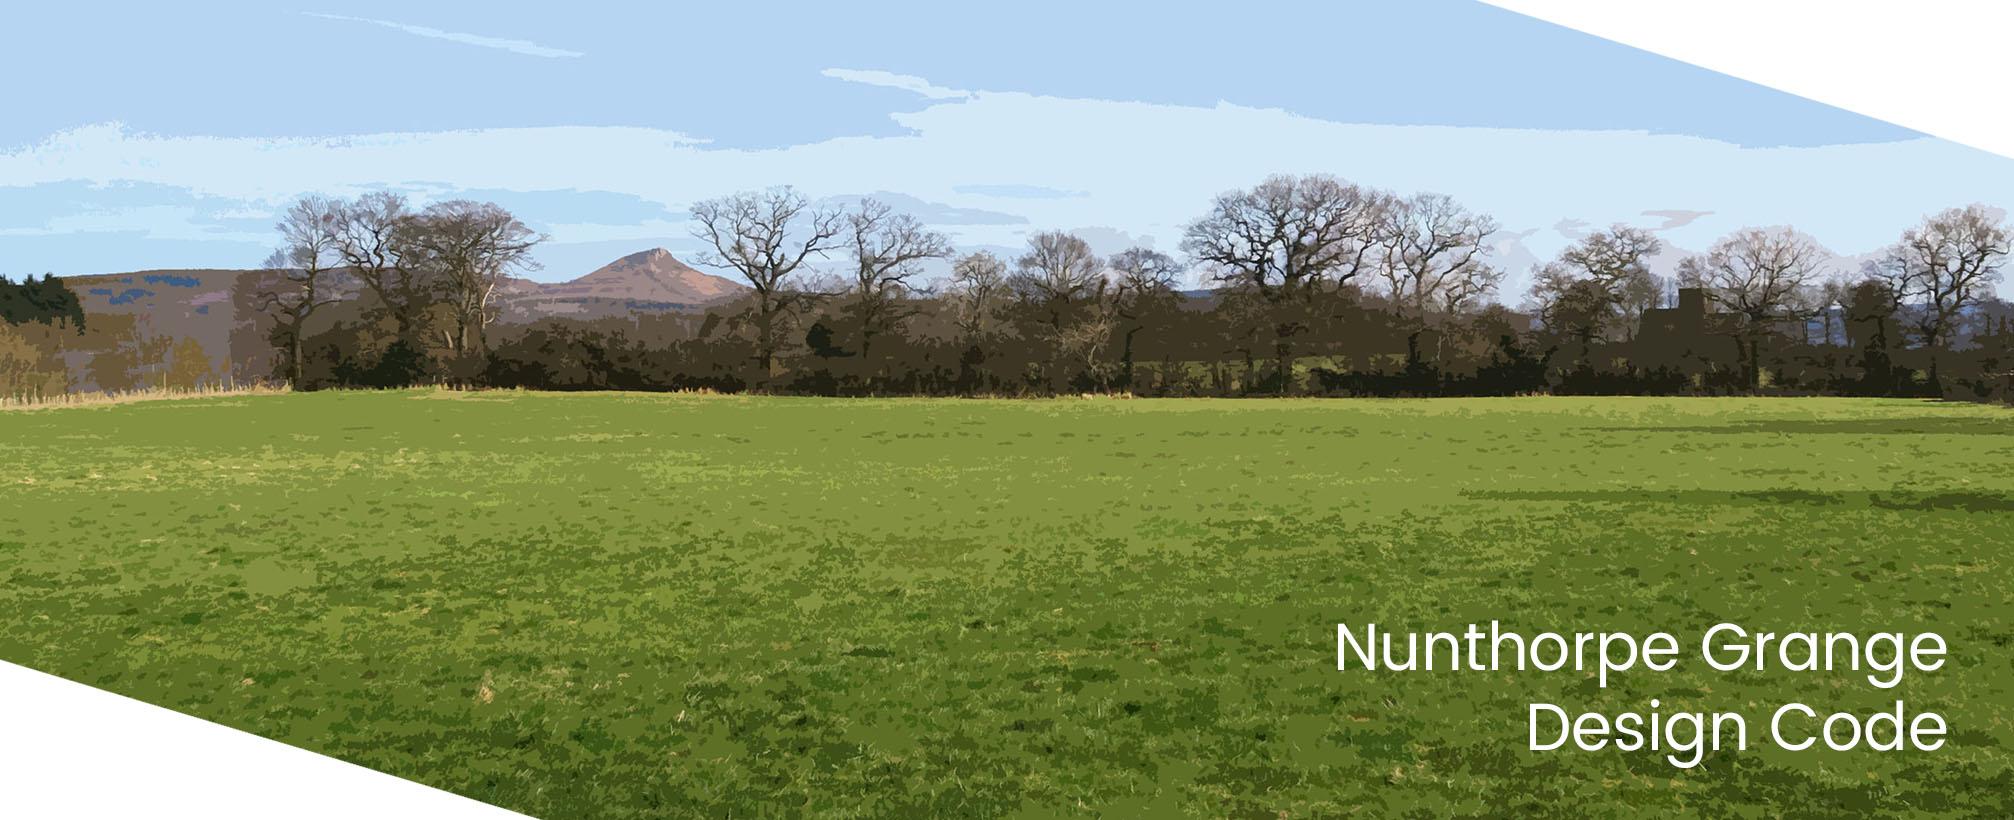 Niven Architects - Nunthorpe Grange Design Code.jpg